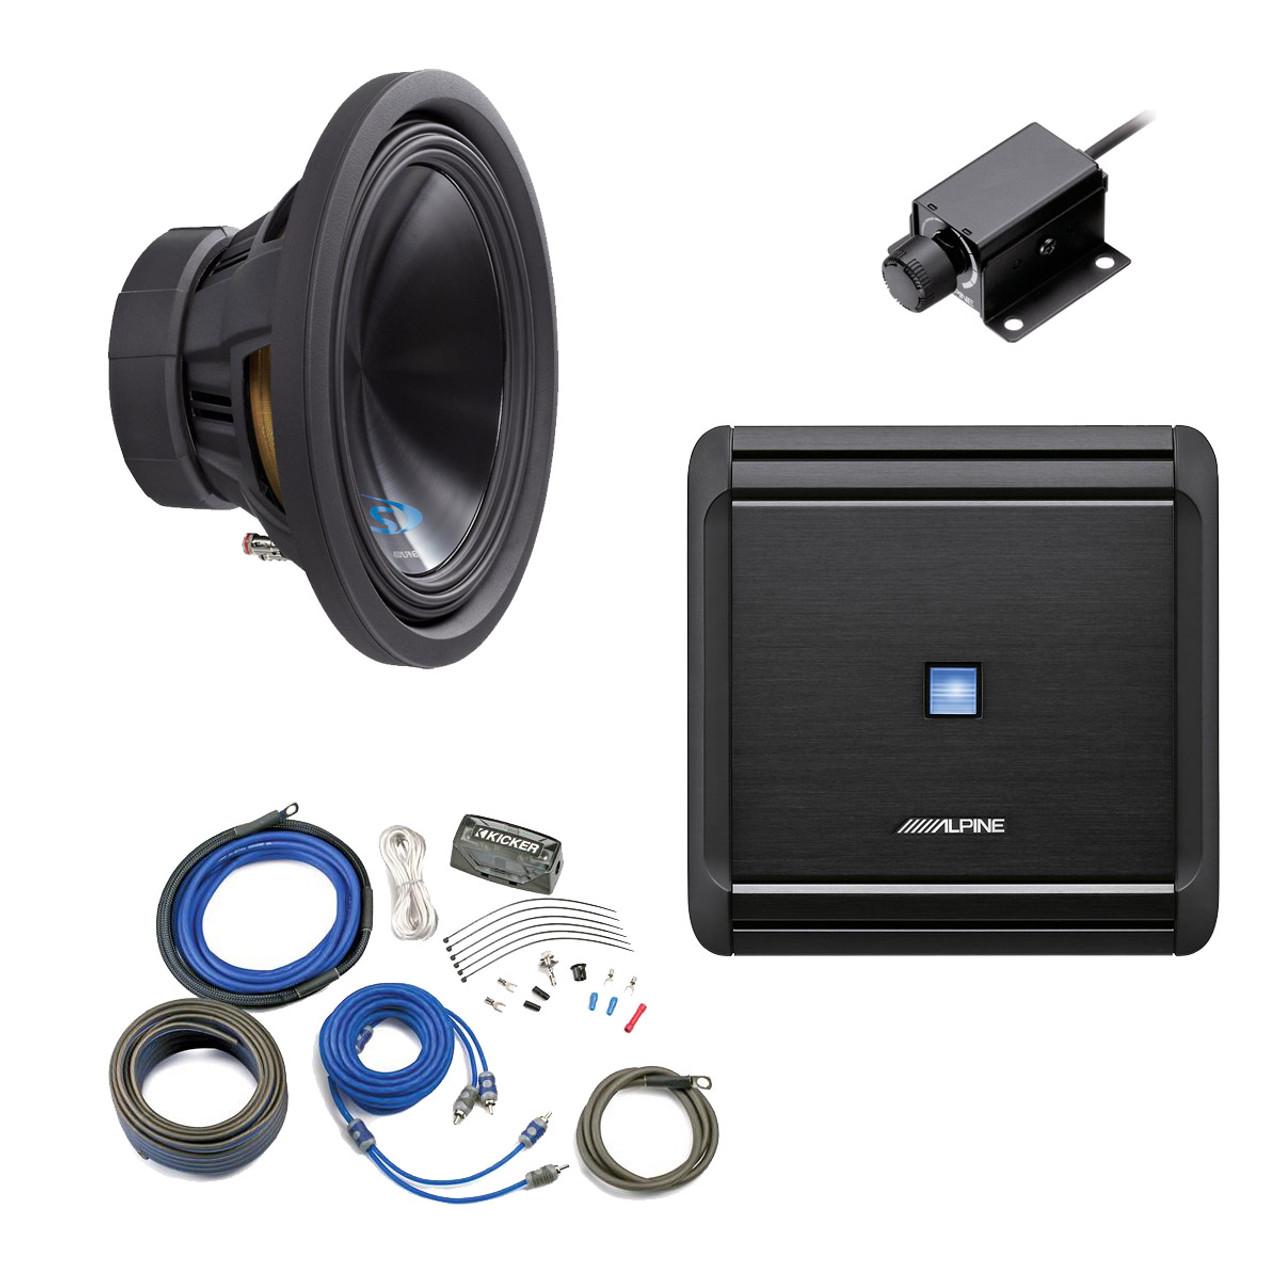 Alpine Bass Package Type S 12 Subwoofer Mrv M500 500 Watt Amp 10 Single Car Box 1200w Amplifier Wiring Kit Knob And Creative Audio